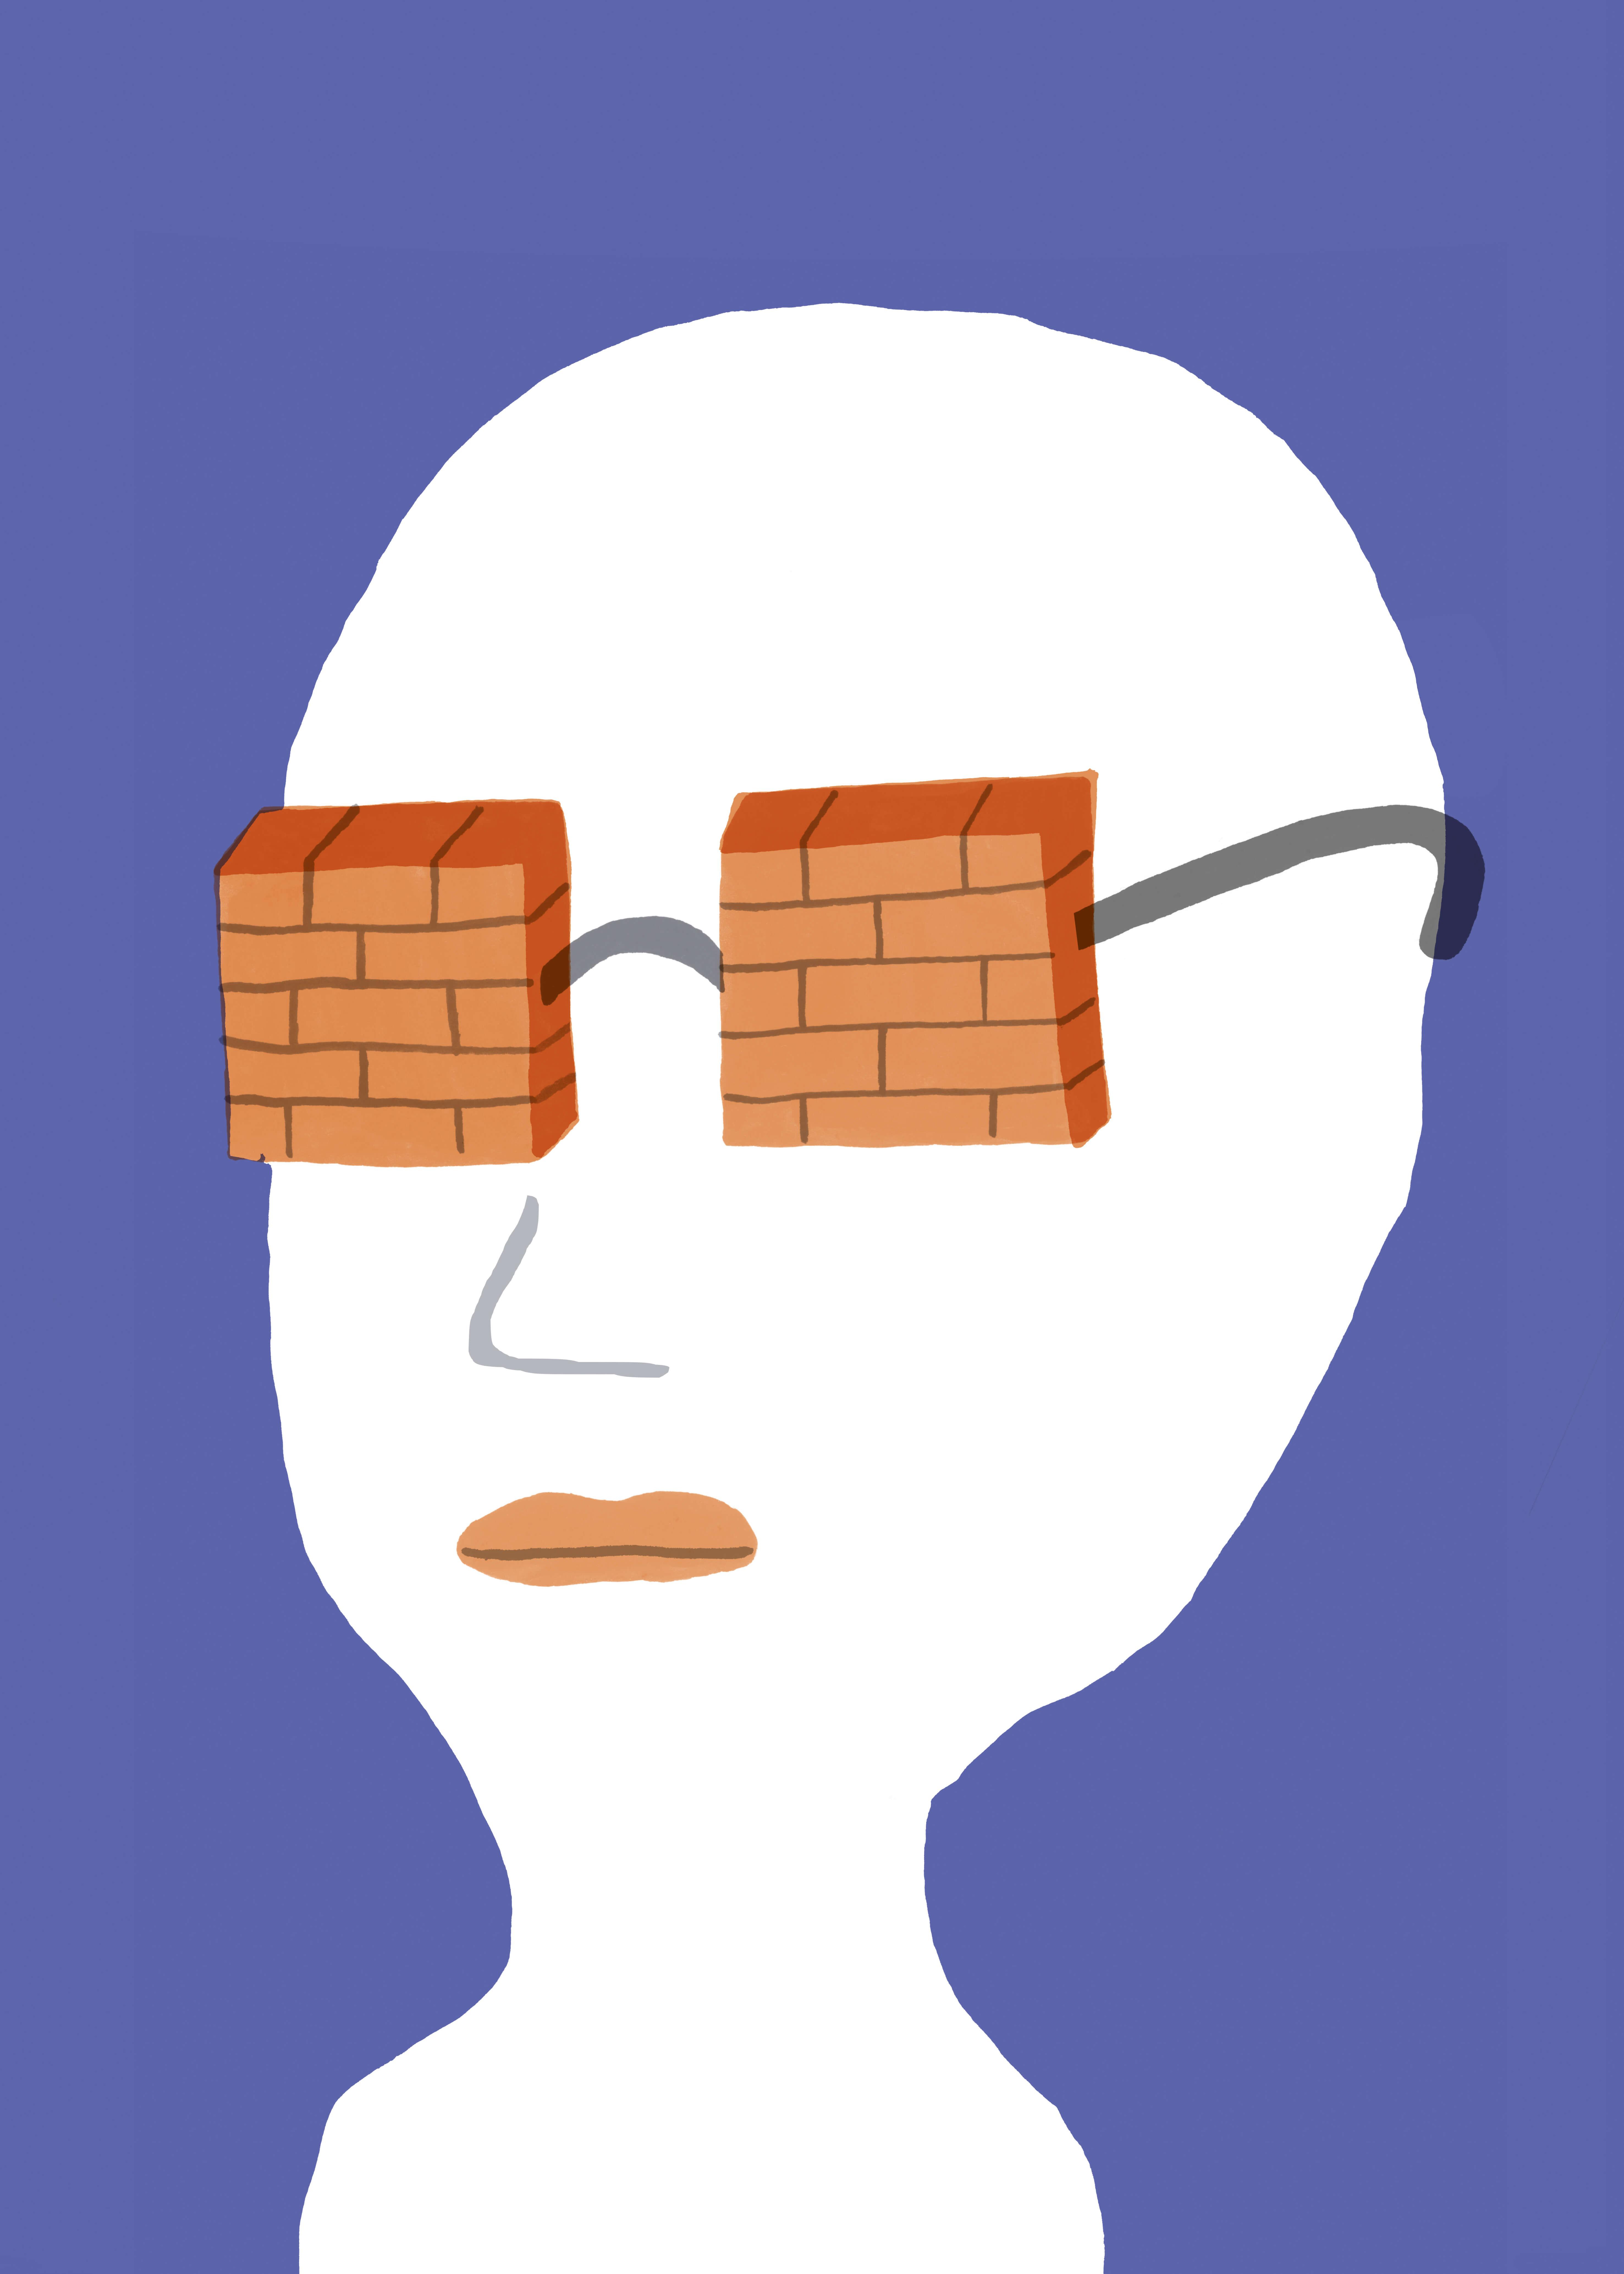 Brick Glasses main image